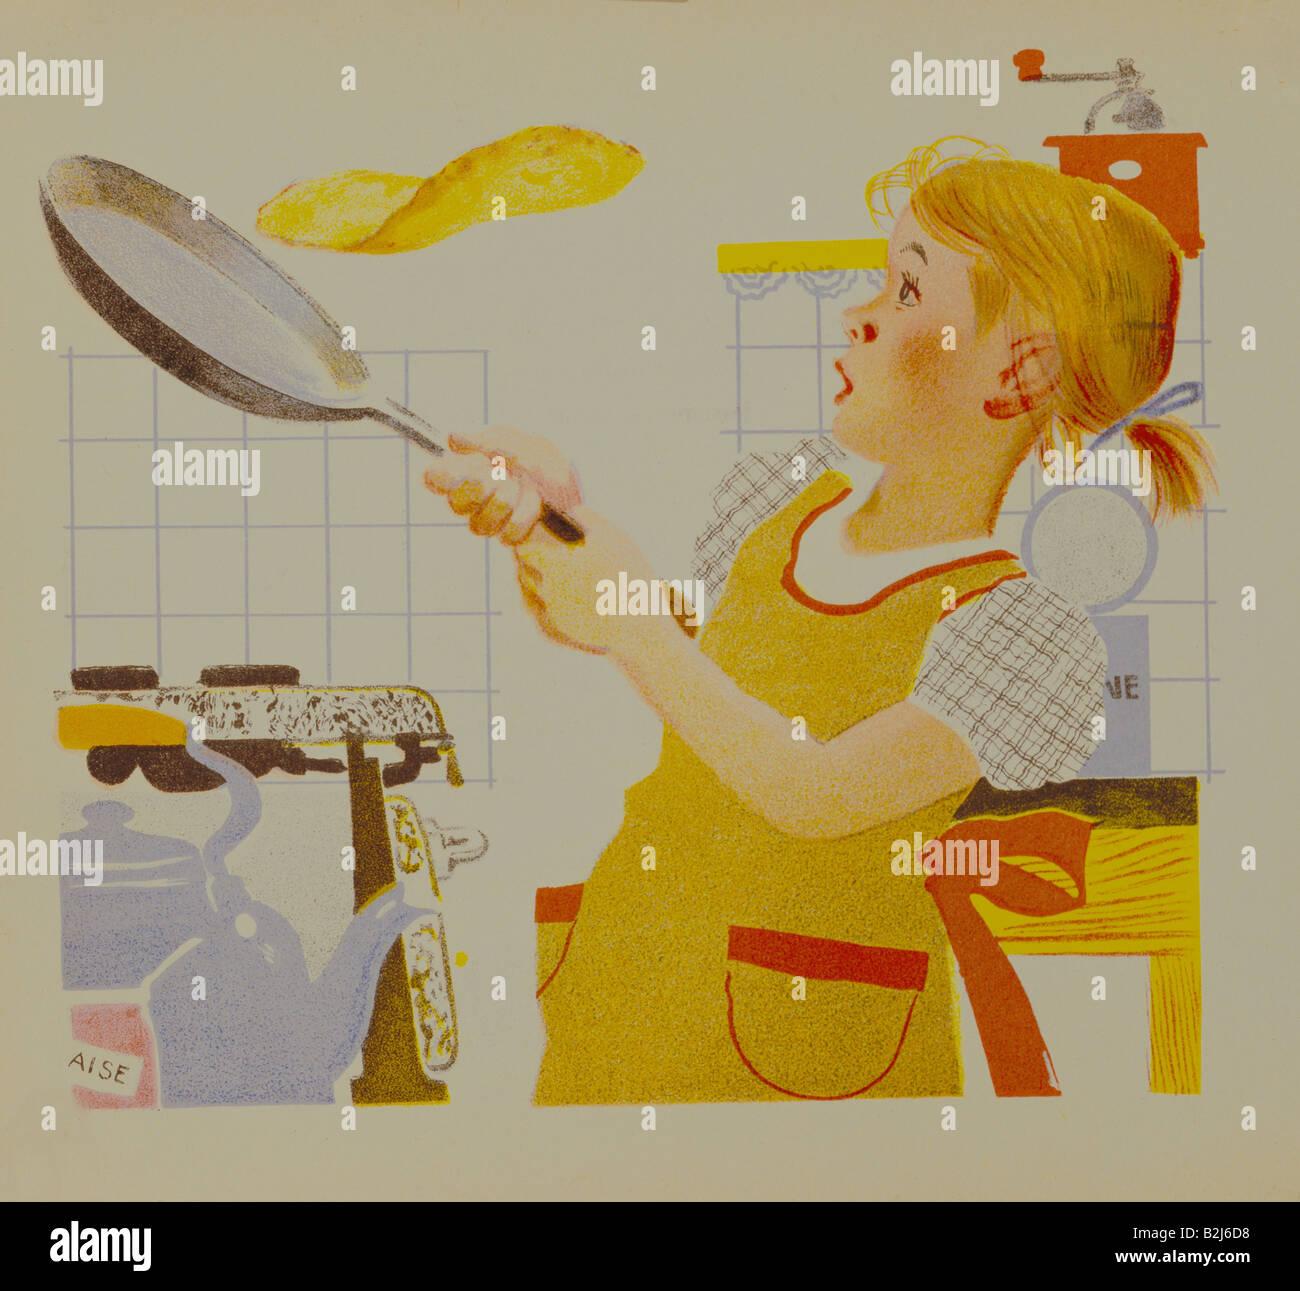 "ÜF, SG hist., Haushalt, cooking and baking, illustration, children`s book ""Calendrier des Enfants"" (Children`s calendar), Stock Photo"